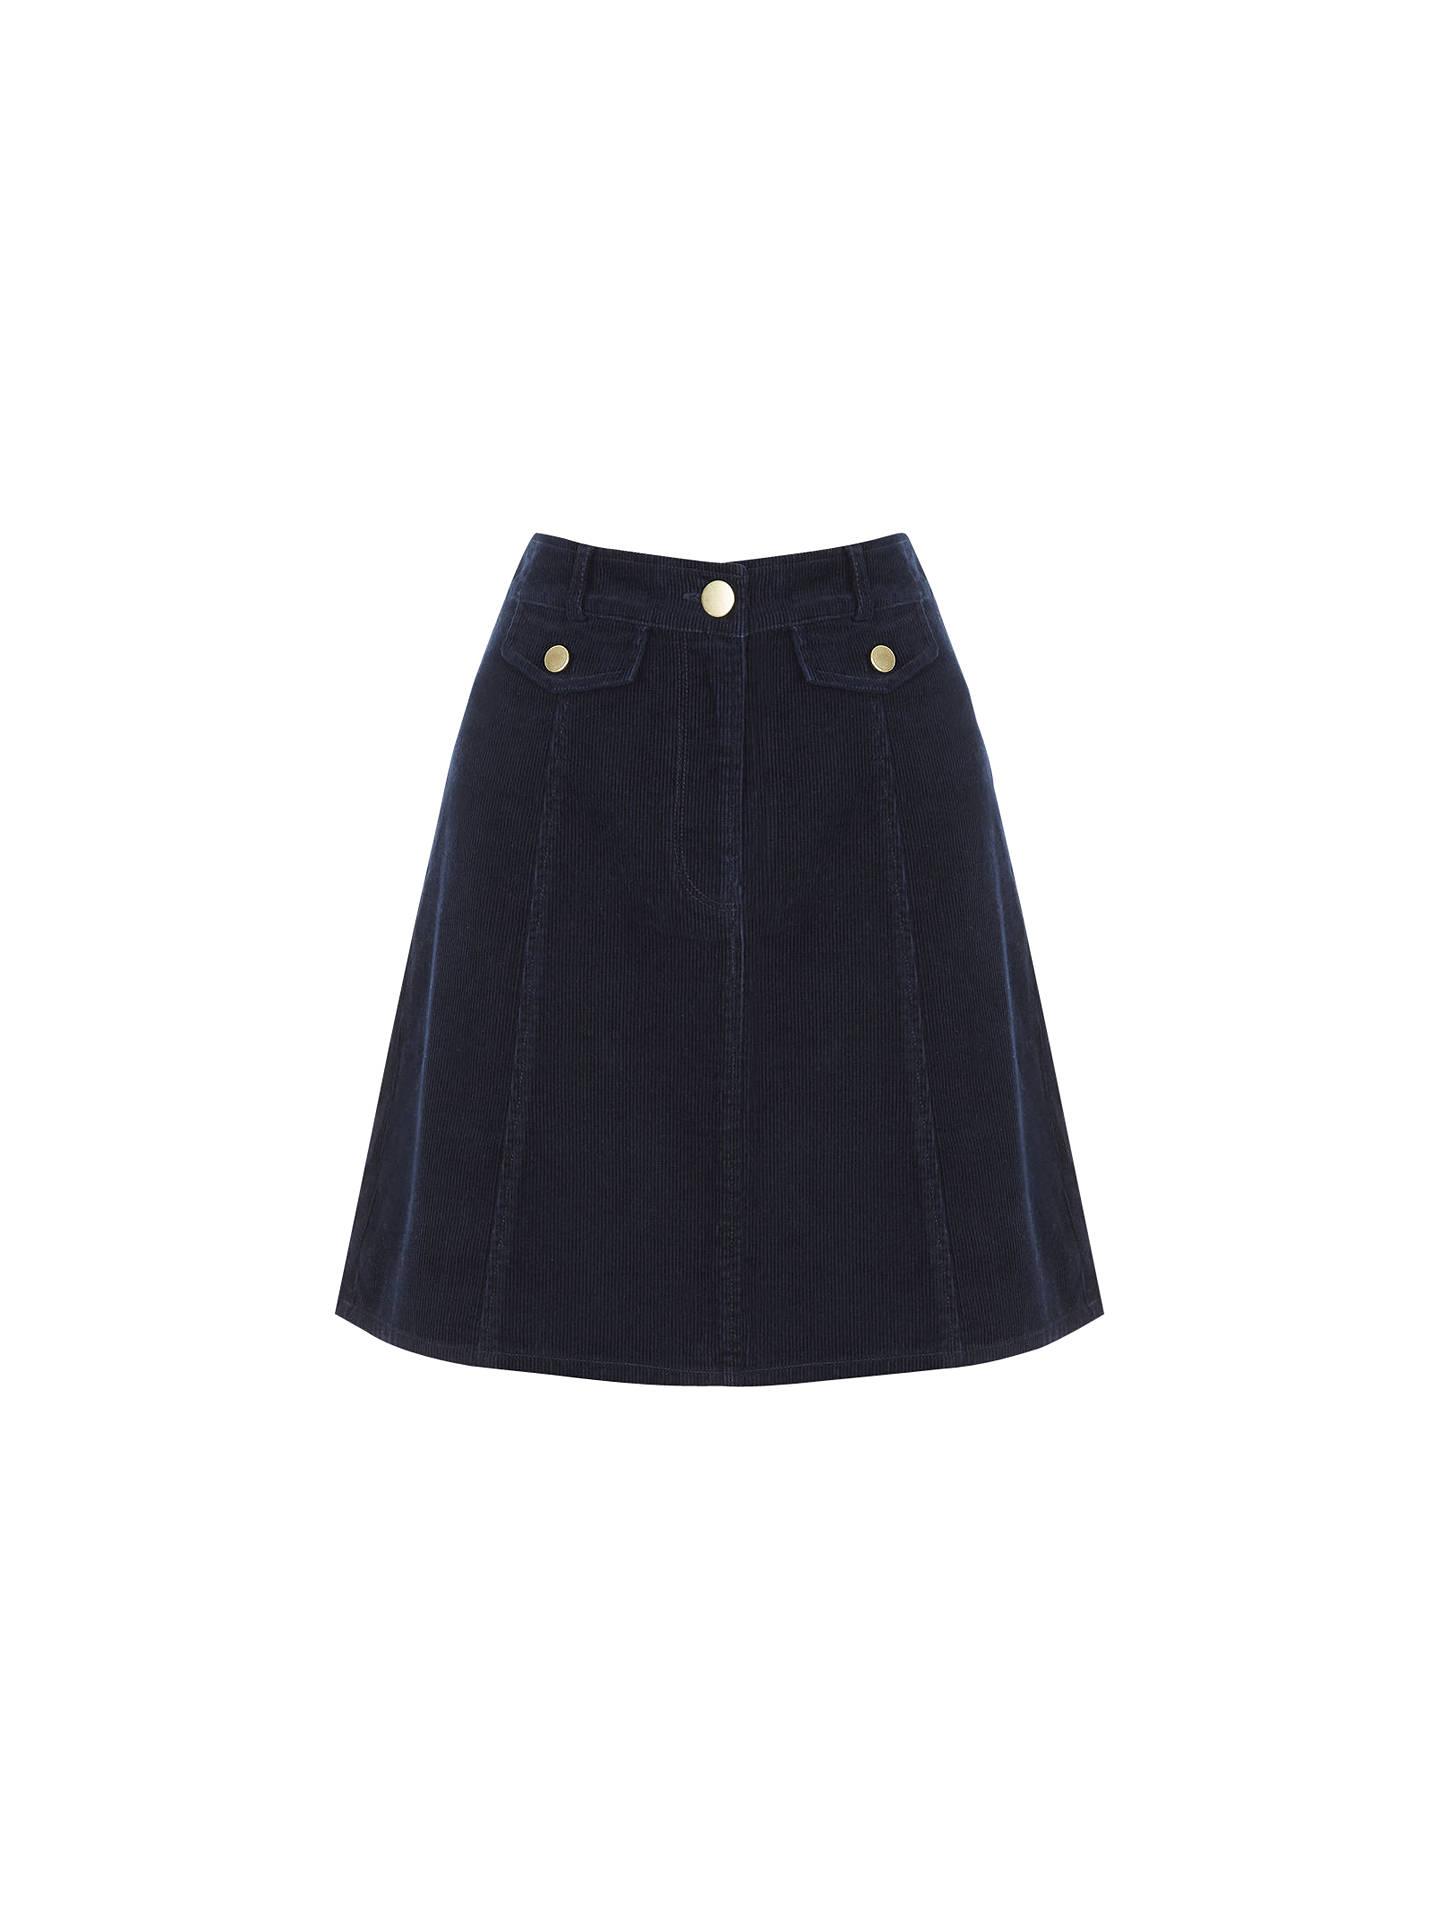 9cad41f6c Black Cord Zip Up Mini Skirt   Saddha